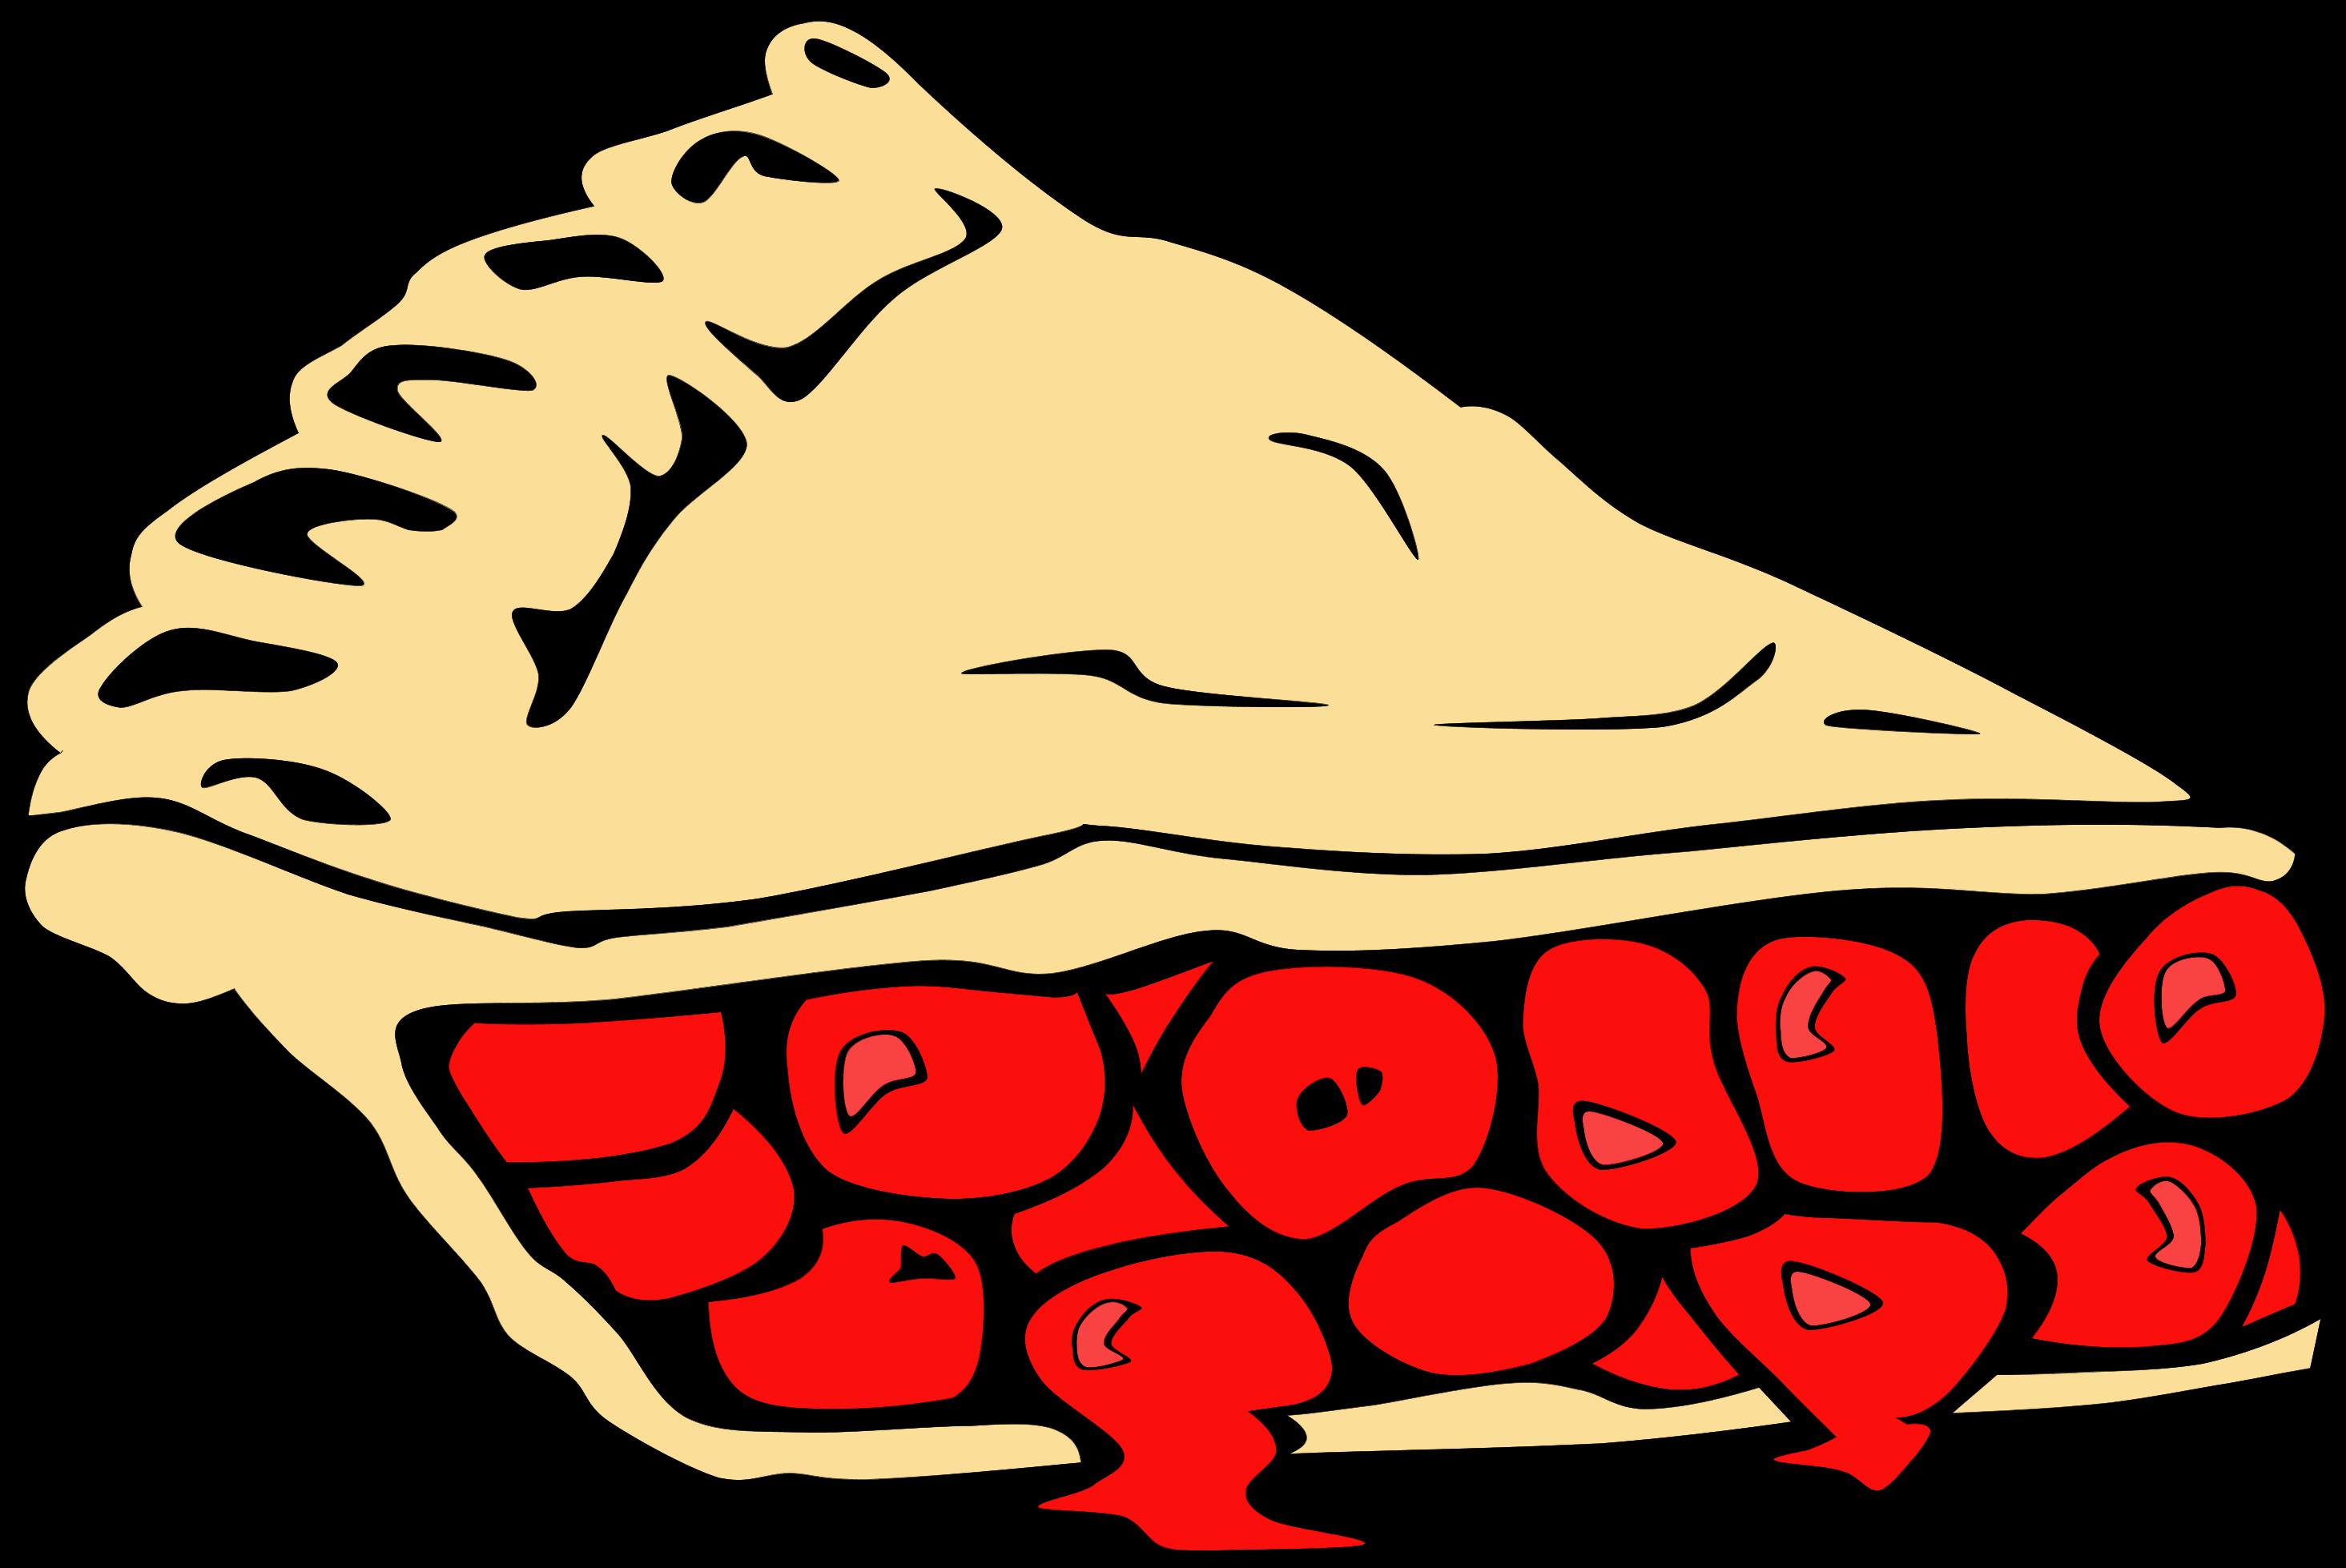 Pie clip art pictures free clipart images